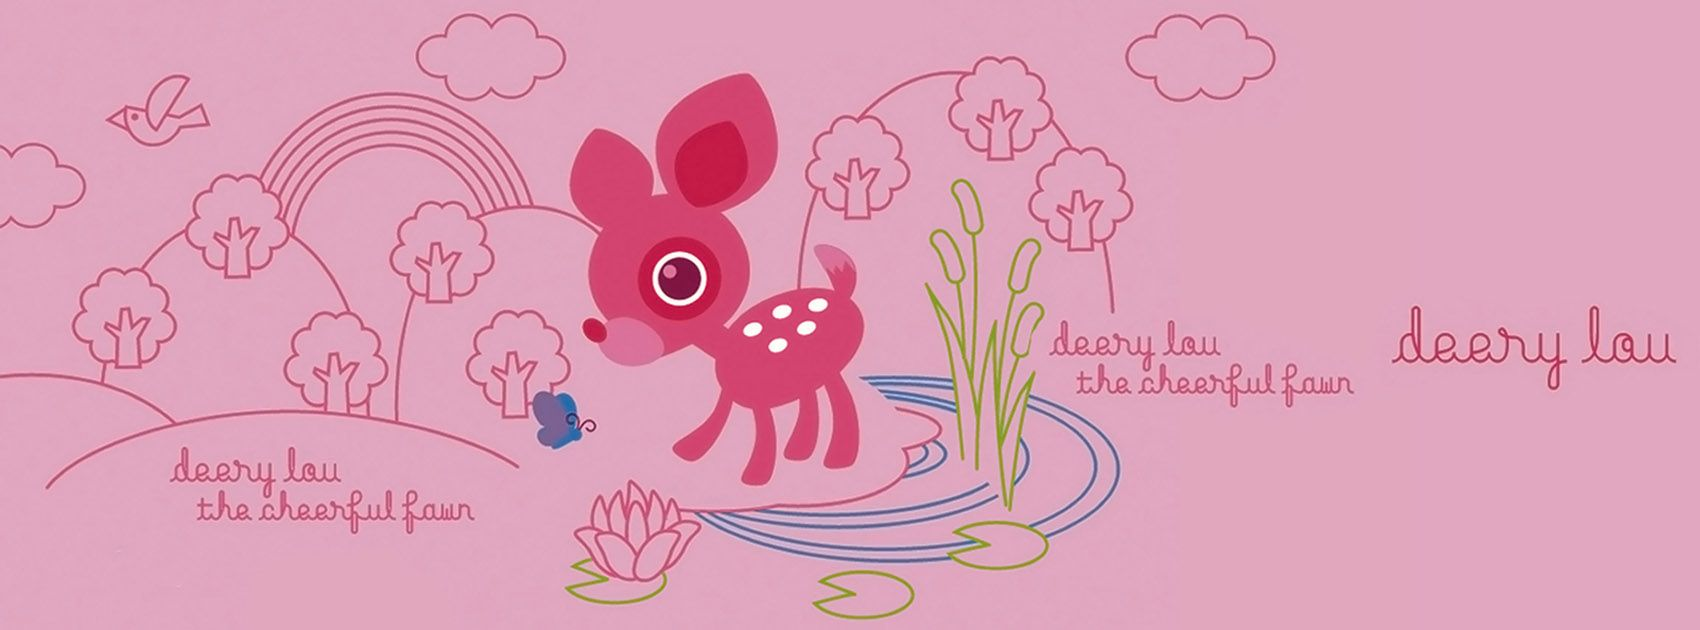 Top Wallpaper Hello Kitty Facebook - 7d44f715f566b8051c32cc80be6a9468  Pic_37869.jpg